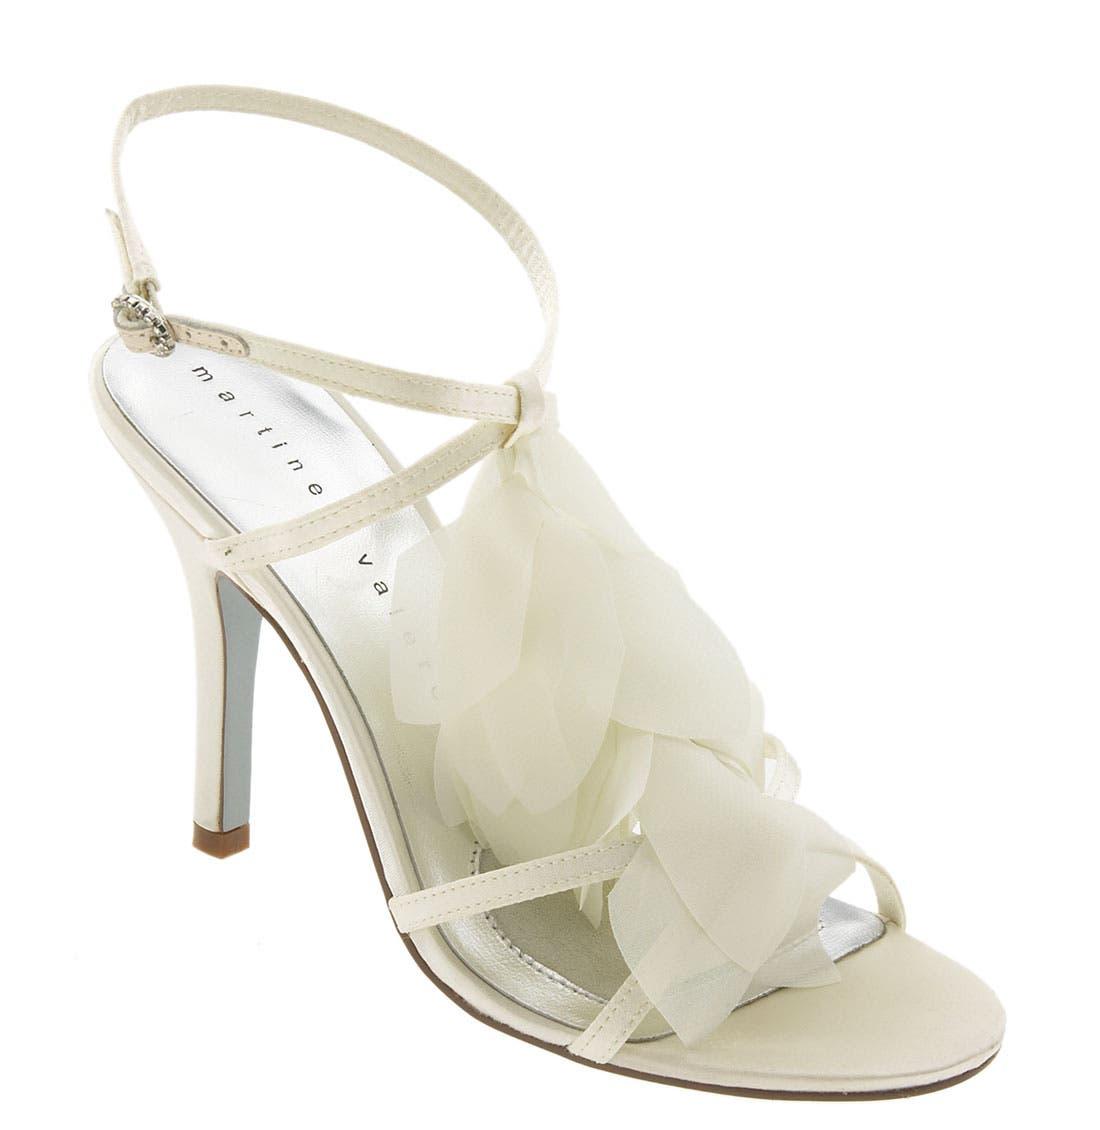 Alternate Image 1 Selected - Martinez Valero 'Corrine' Sandal